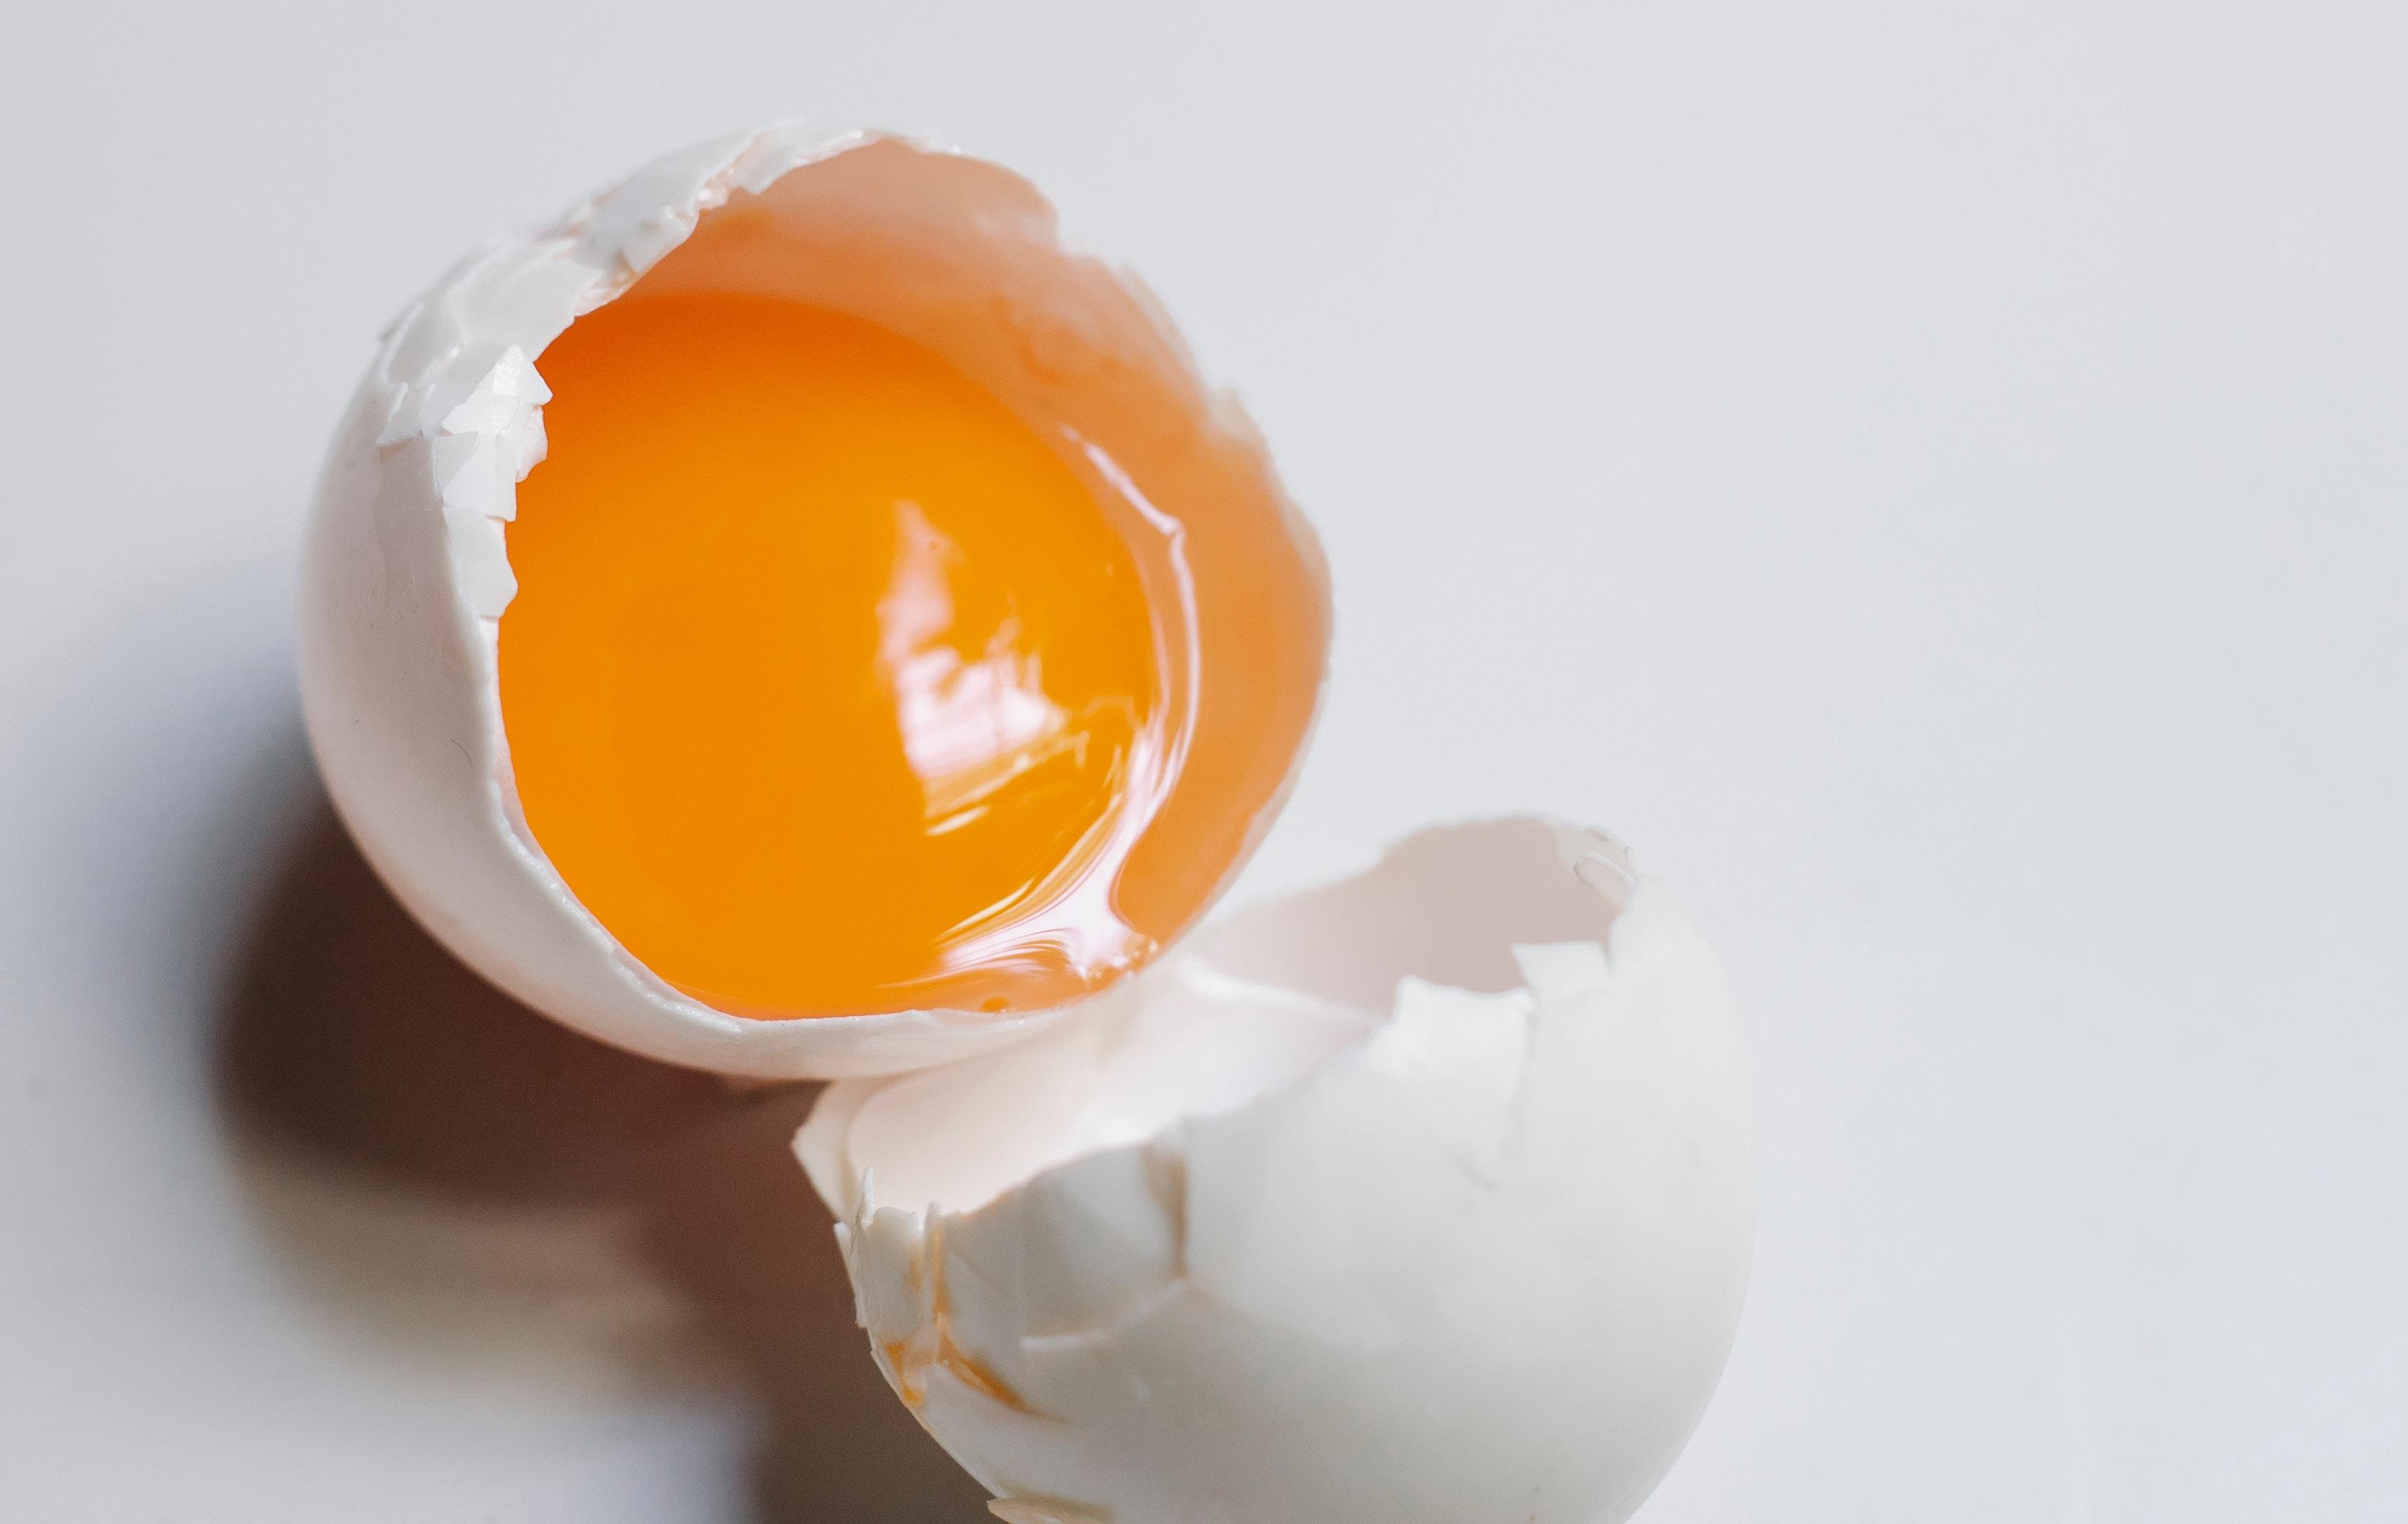 Uovo contiene vitamina D